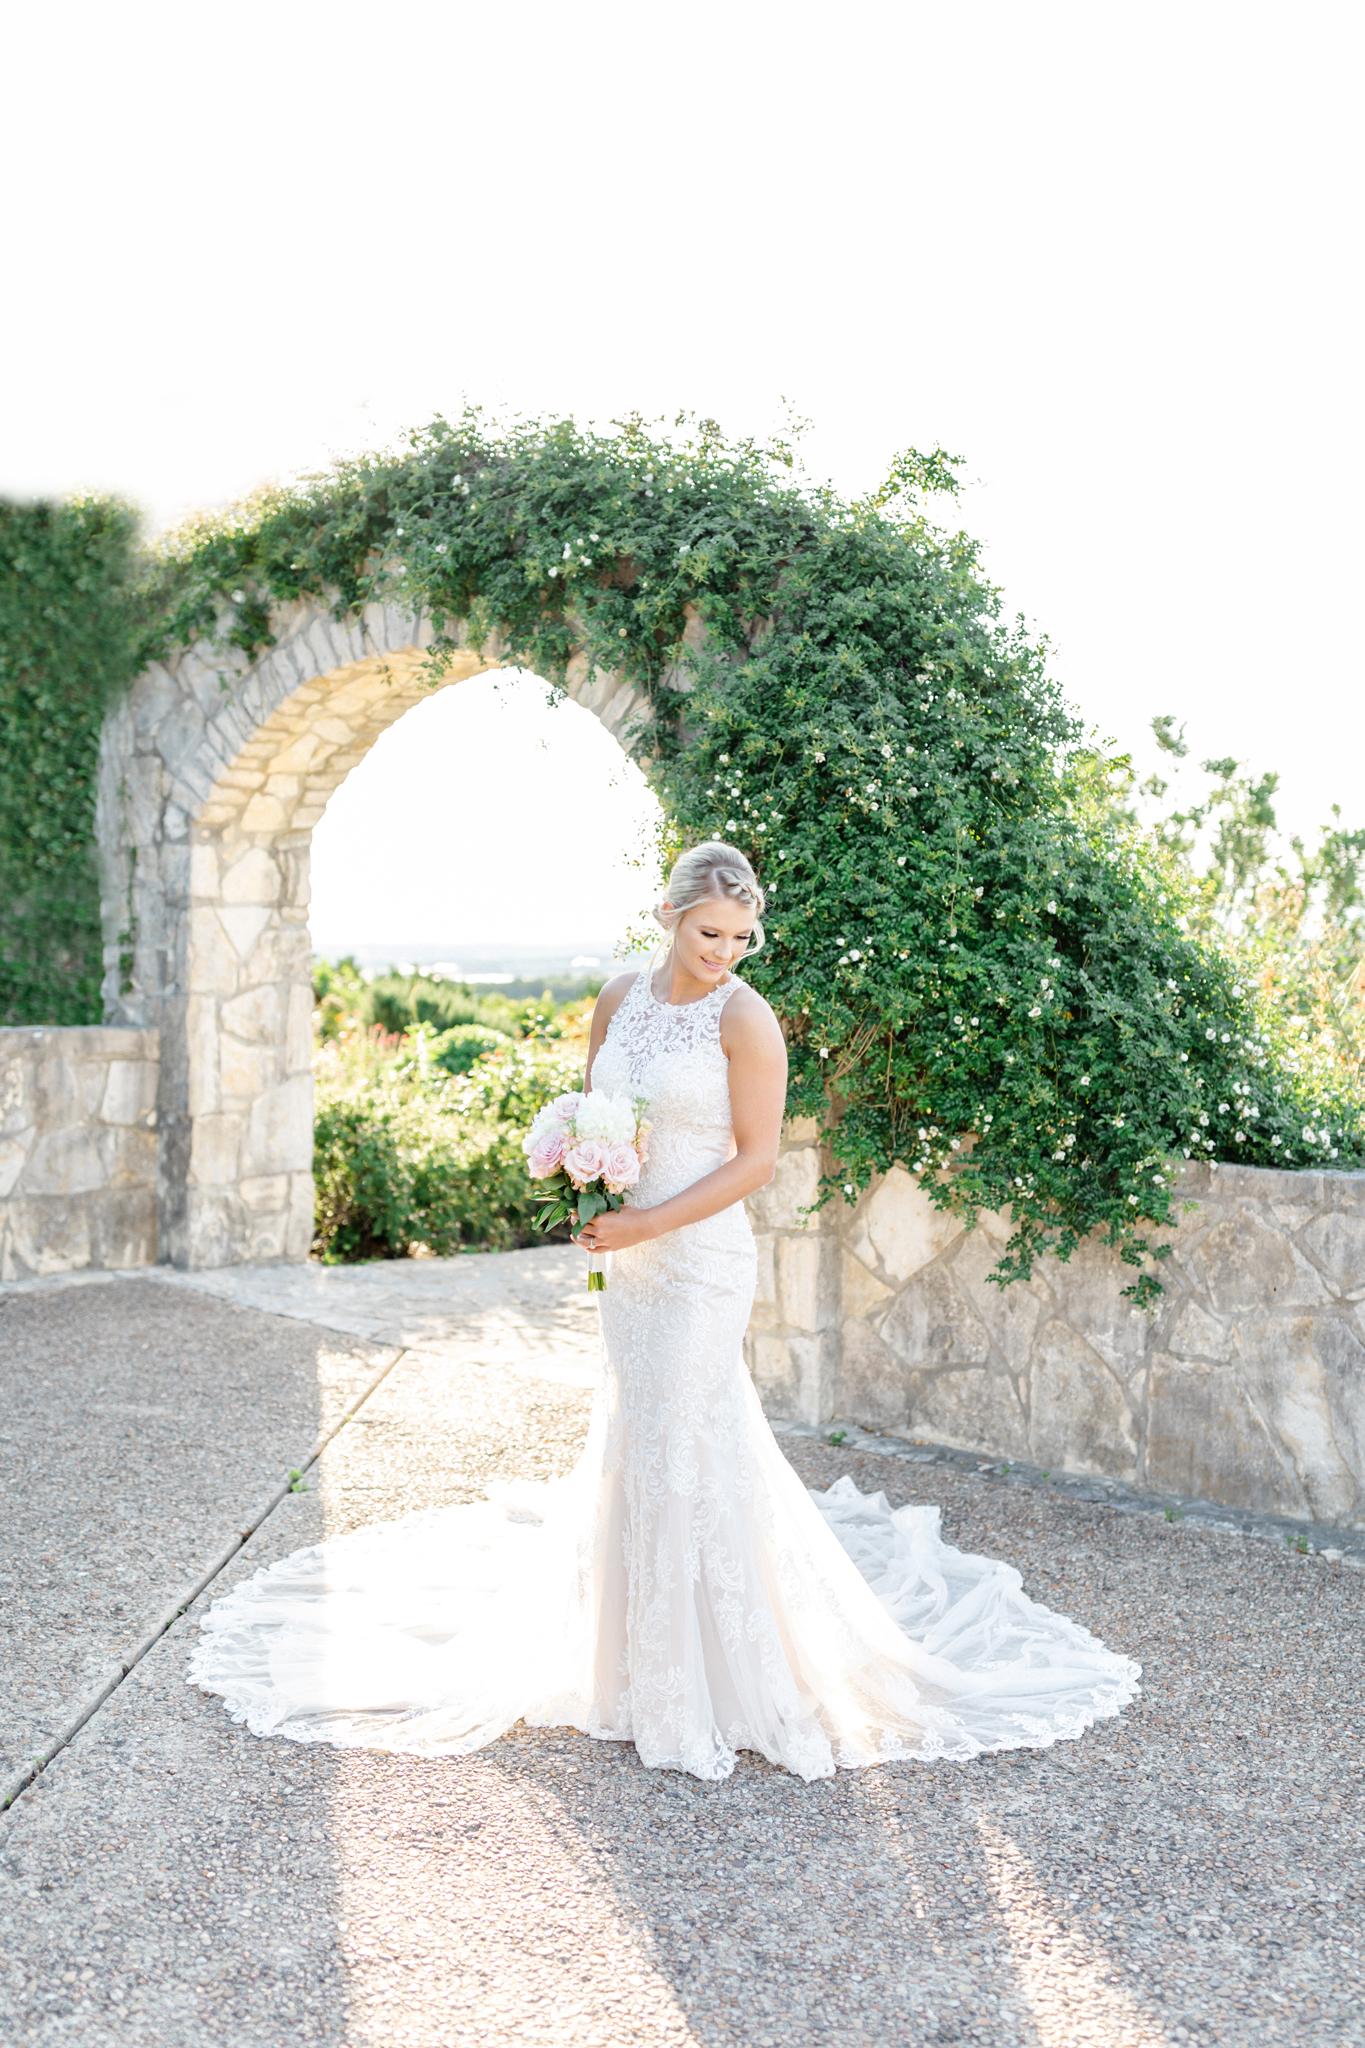 San Antonio Helotes Boerne Fredericksburg Fischer Austin Texas hill country Wedding Engagement Photographer bridal session bridal photos San Antonio bride bridals Rancho Mirando Guest Ranch wedding venue